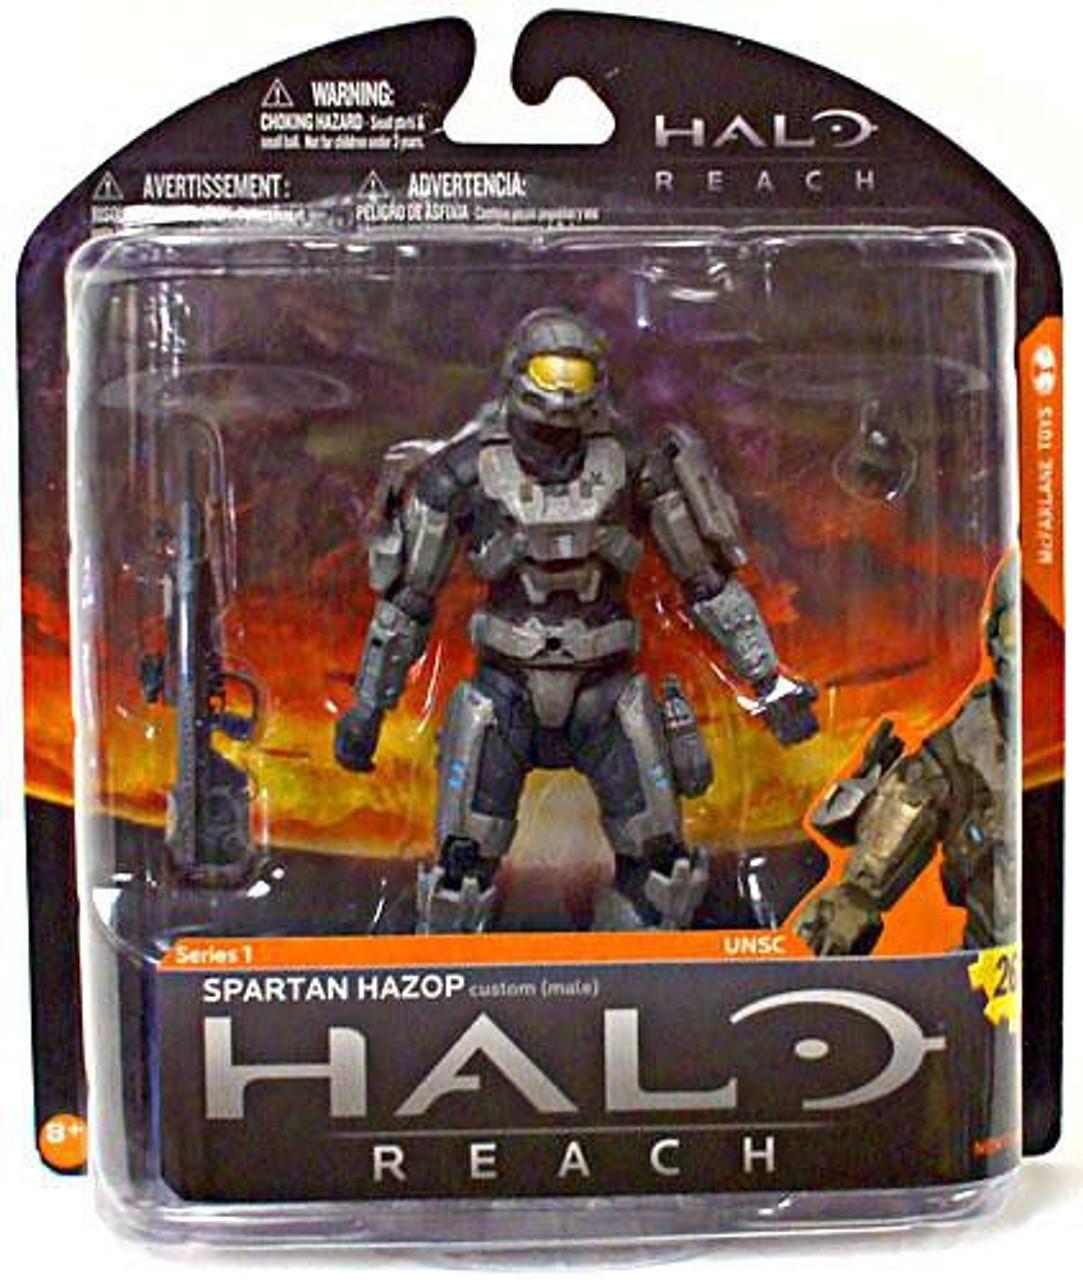 McFarlane Toys Halo Reach Series 1 Spartan Hazop Exclusive Action Figure [Steel]